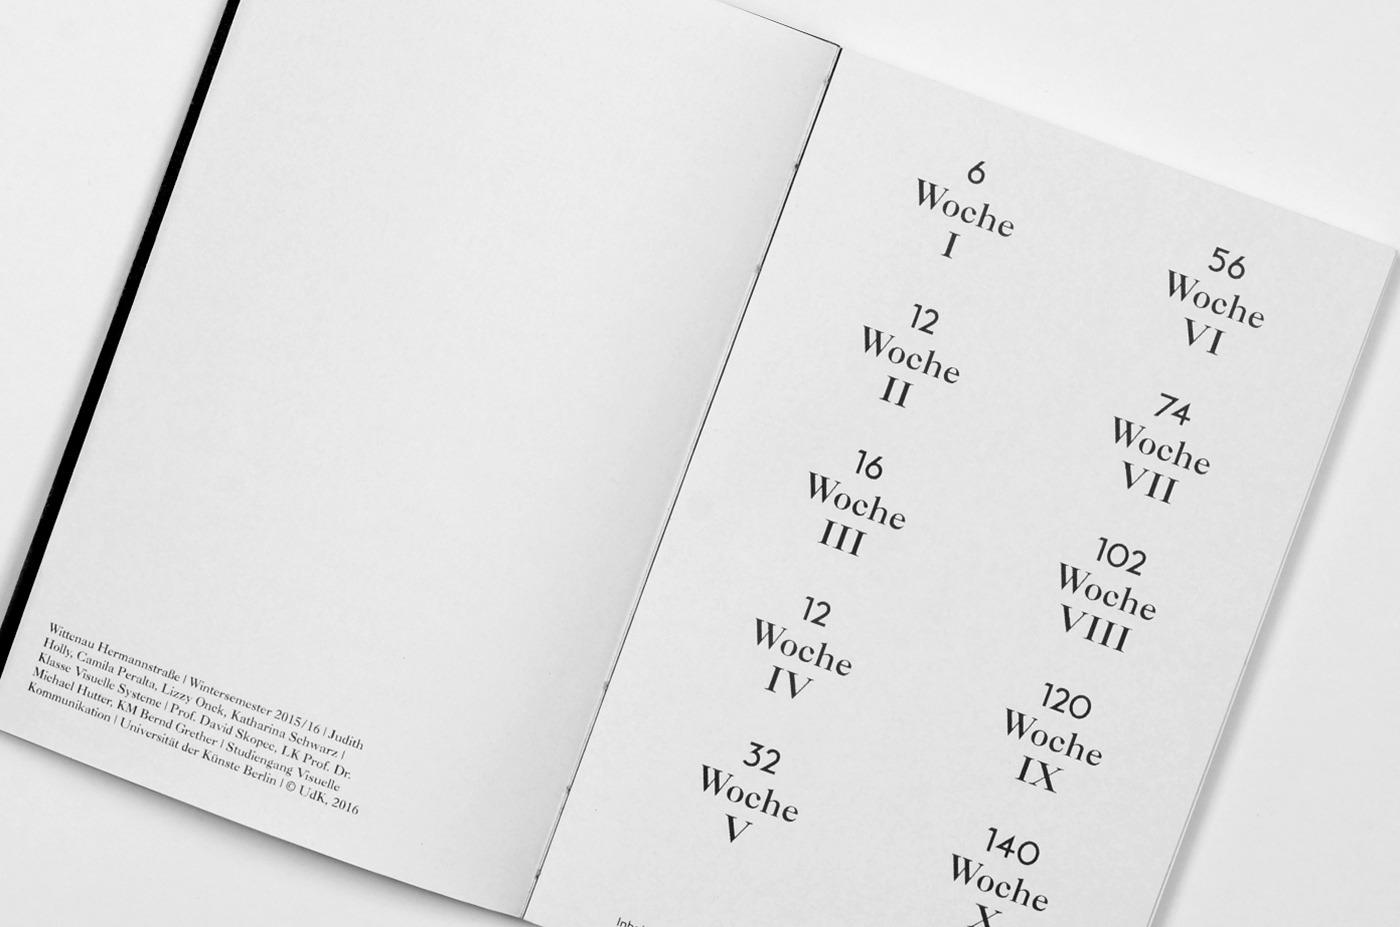 camila_peralta_camswork_wittenau_hermanstrasse_publication_08